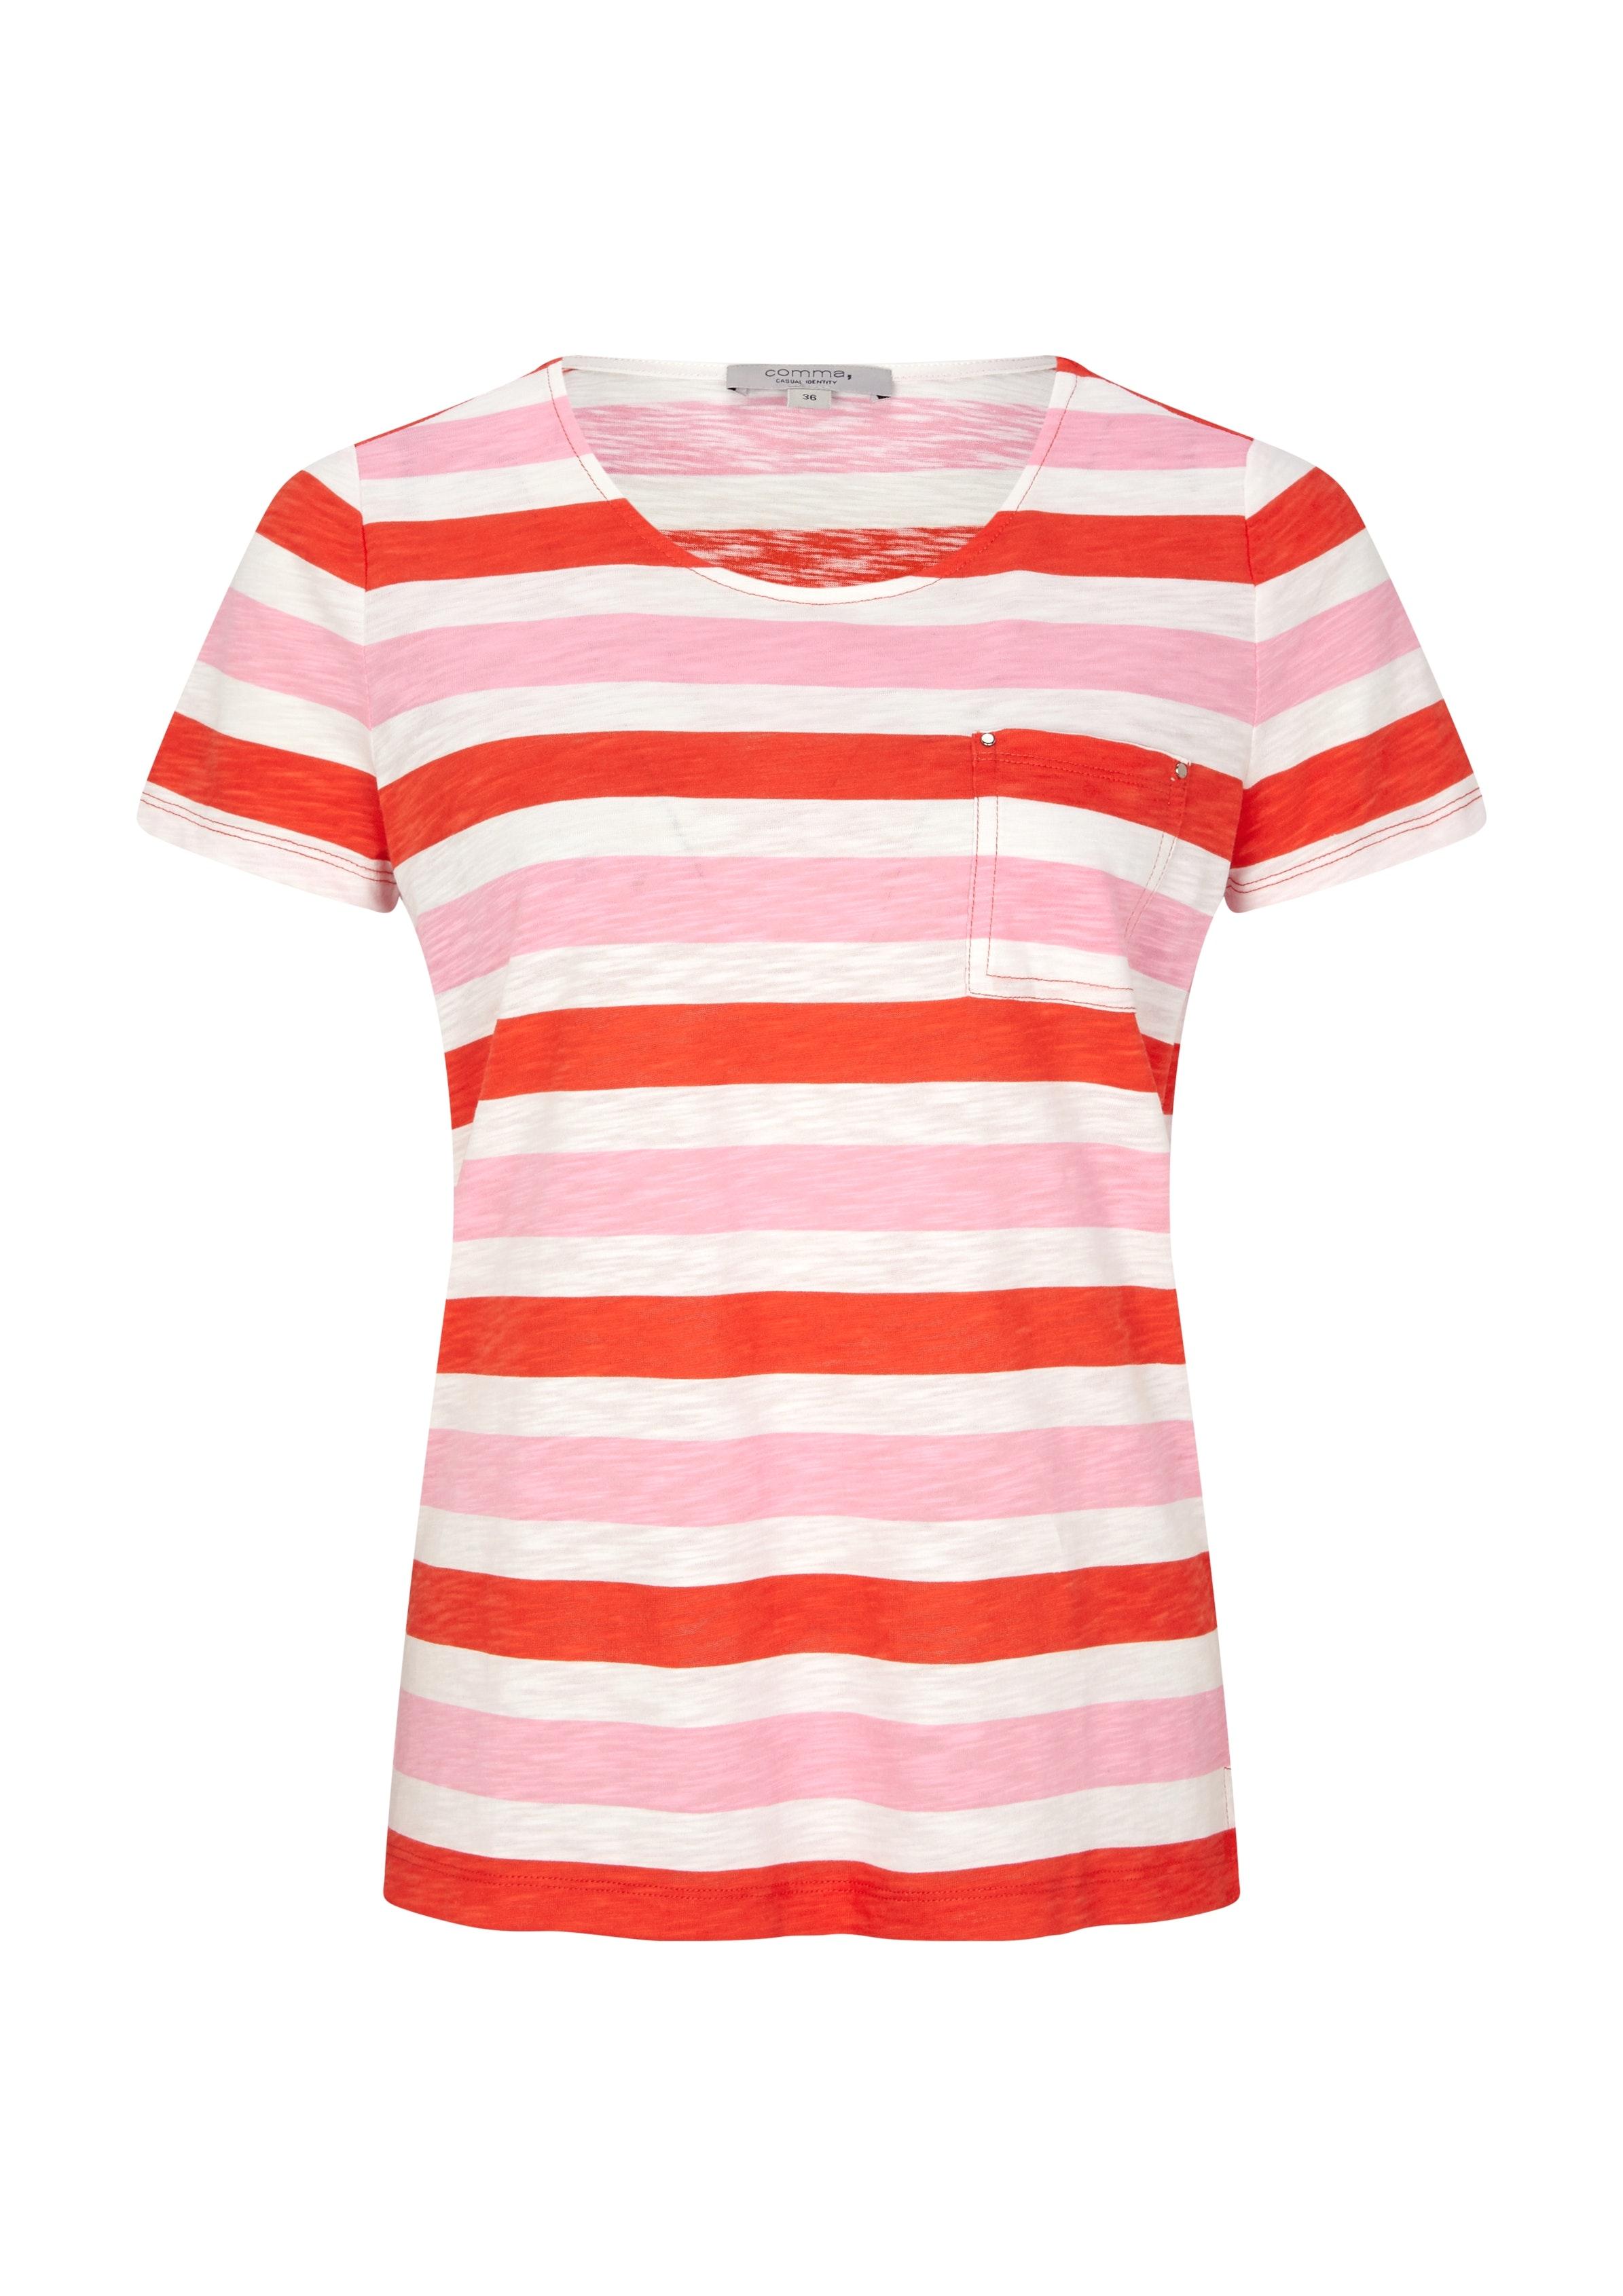 Comma Kurzarm Shirt mit Streifen